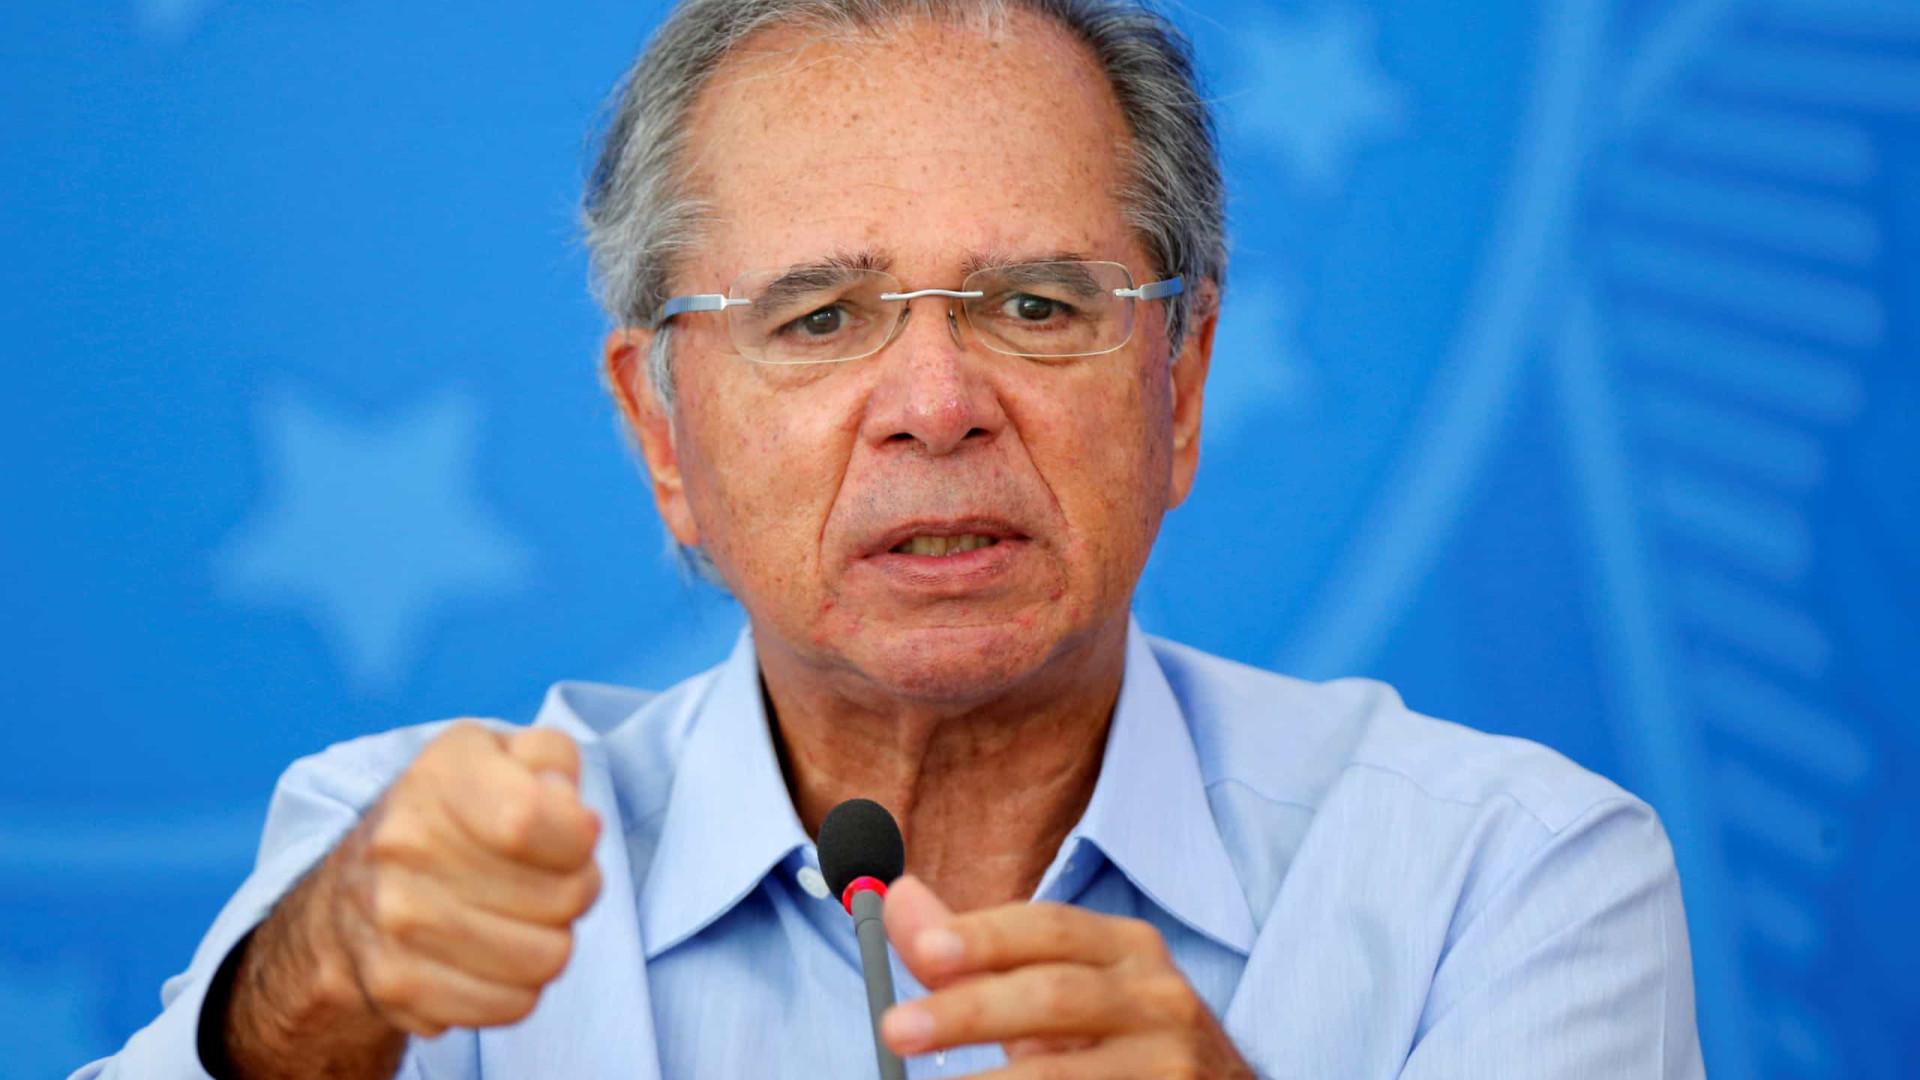 Governo confirma que exame de Guedes para covid-19 deu negativo